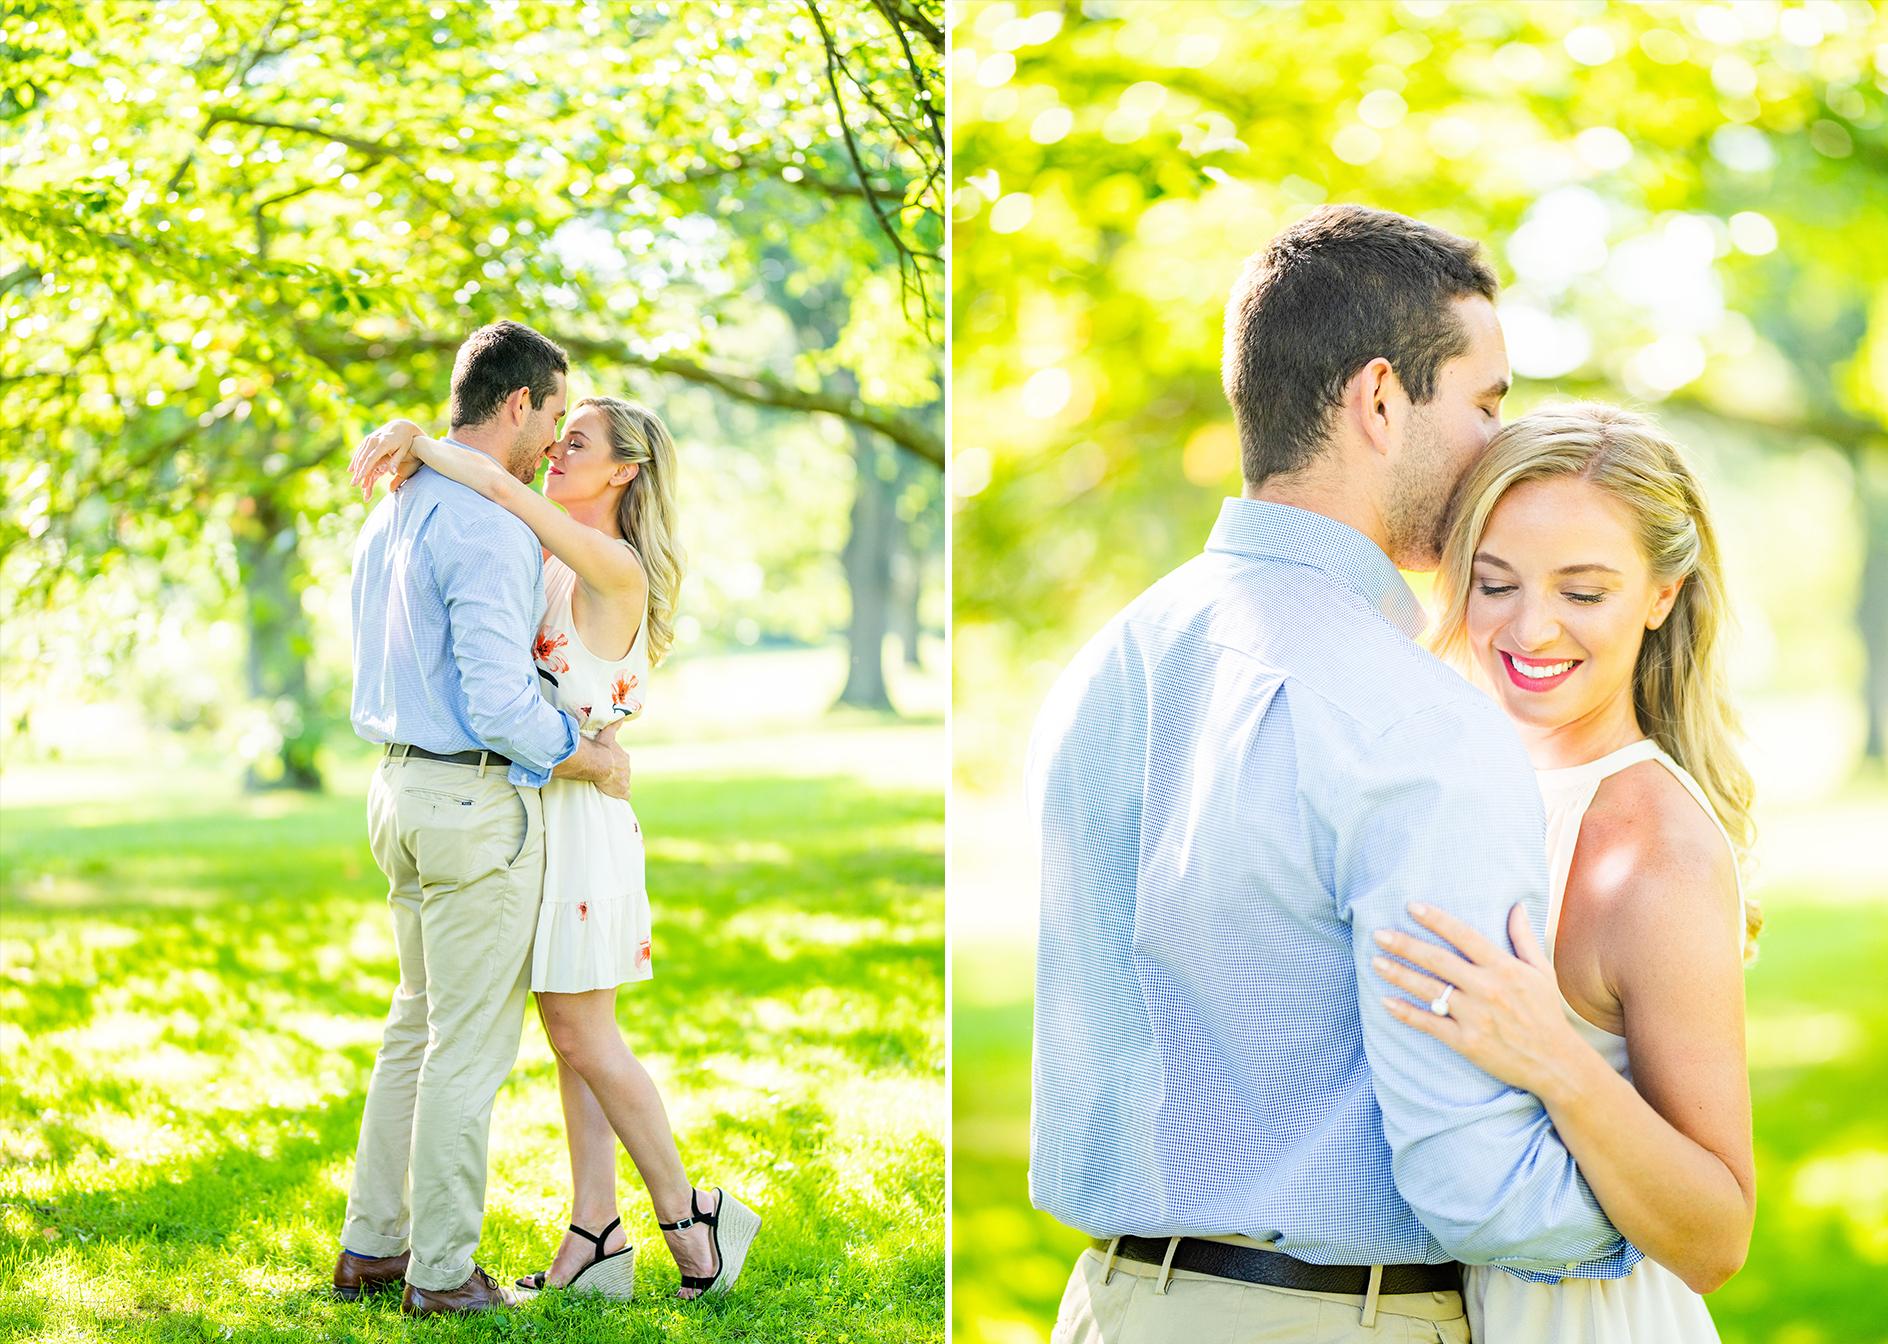 Planting Fields Arboretum Engagement Shoot | Oyster Bay Engagement Shoot | Long Island Wedding Photographer7